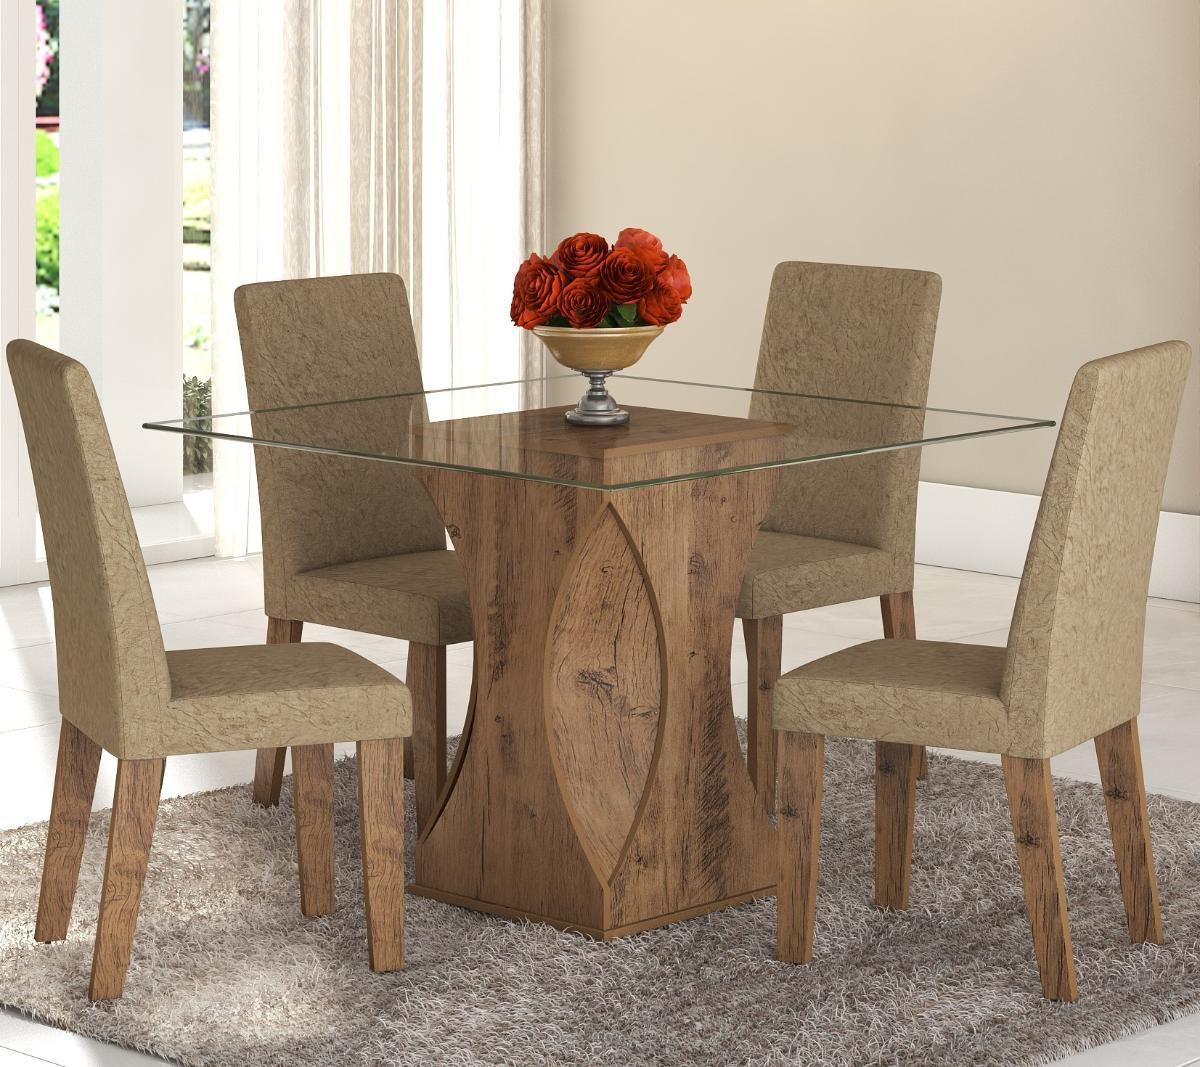 Asheville Craigslist Furniture Asheville Craigslist Furniture Bedroom Furniture For Sale